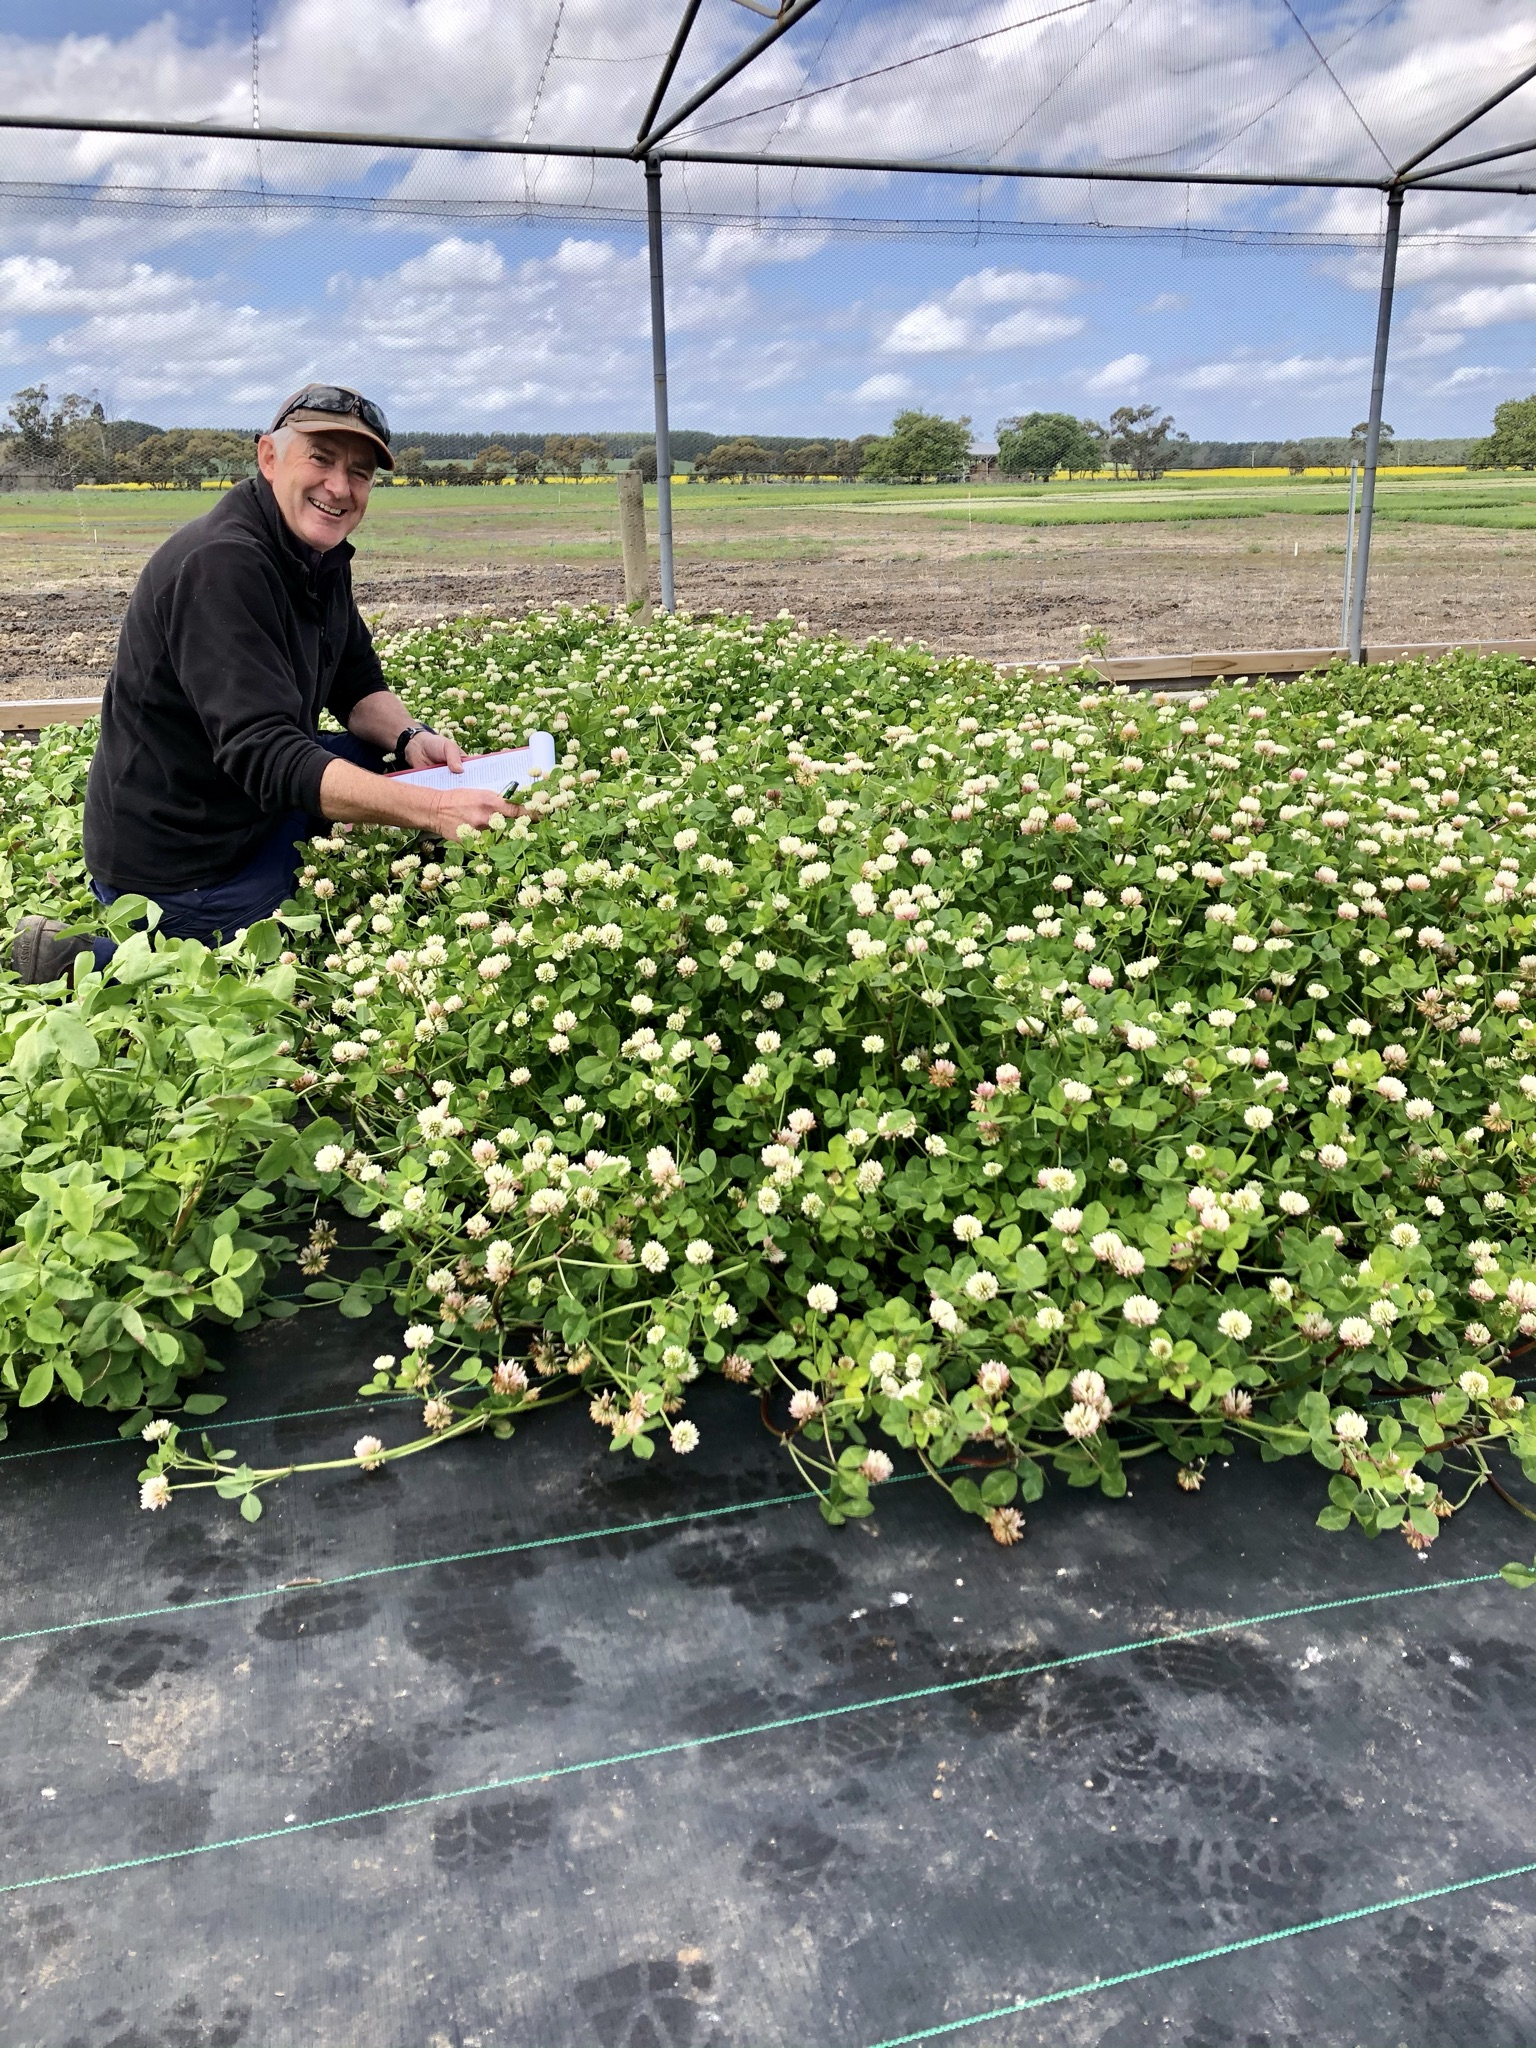 Plant breeding clovers